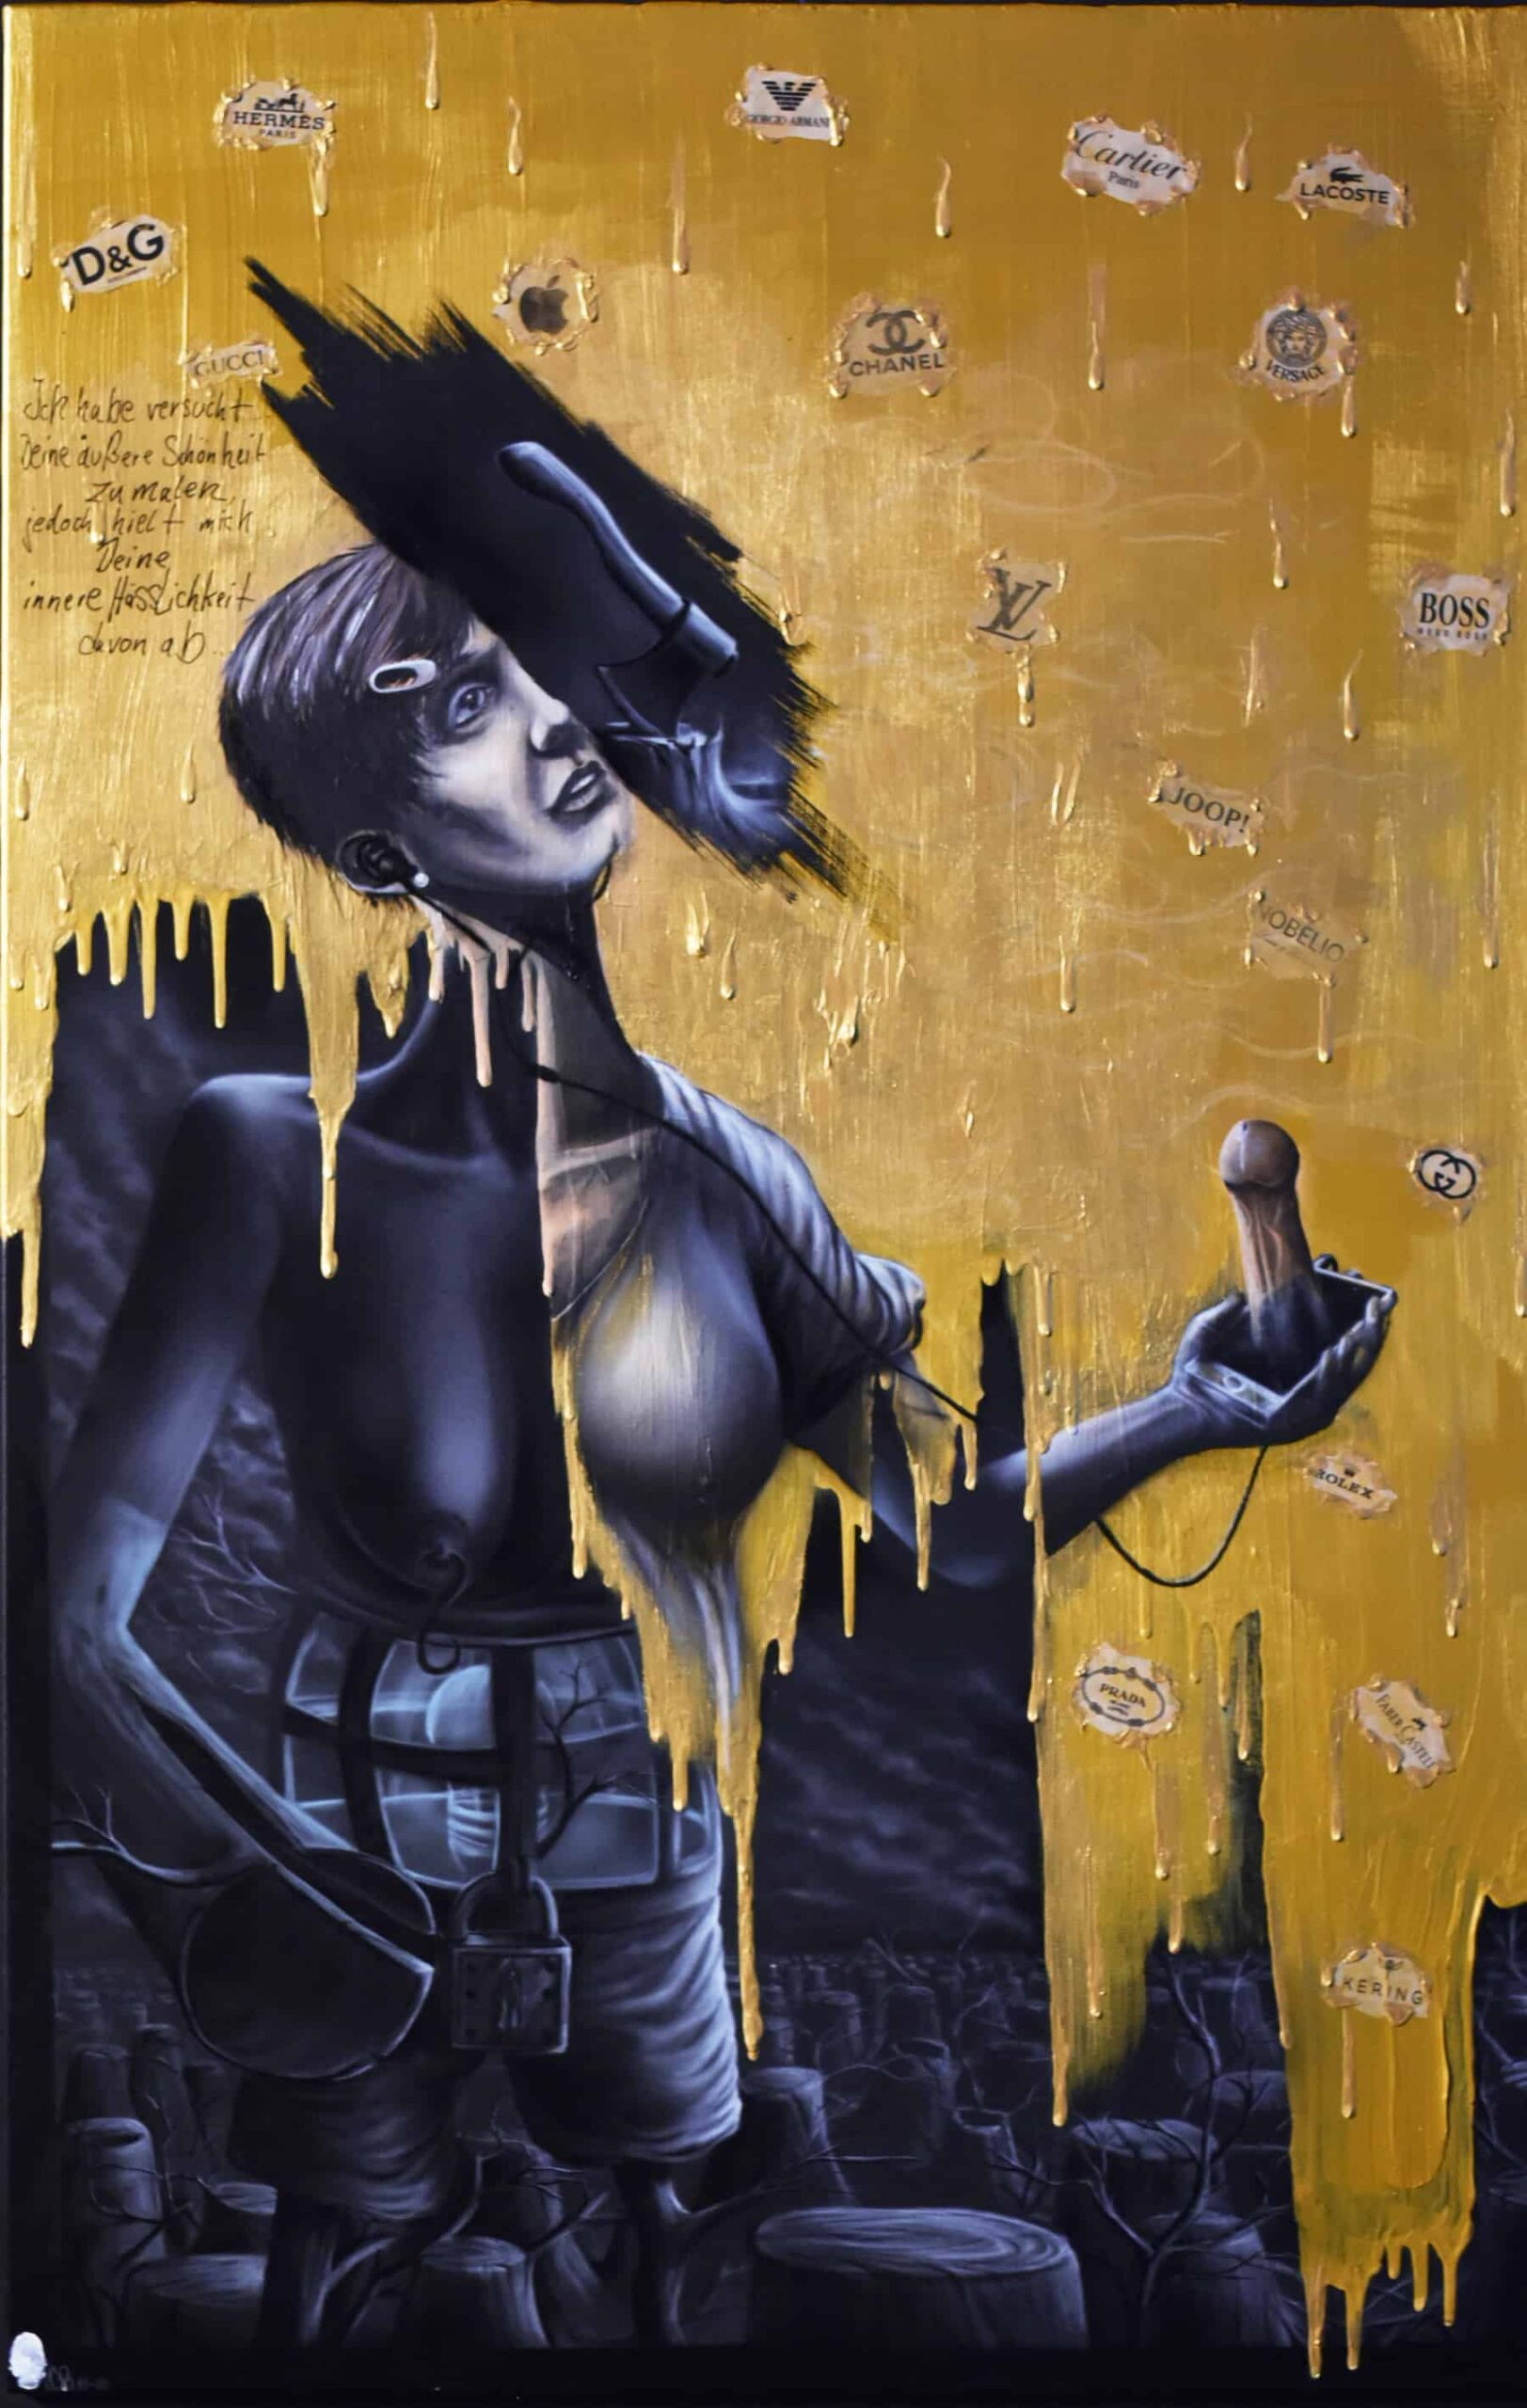 abgestumpfteOberflächligkeitÖlundAcrylaufLinwand by Steve Bauer Painting Leipzig